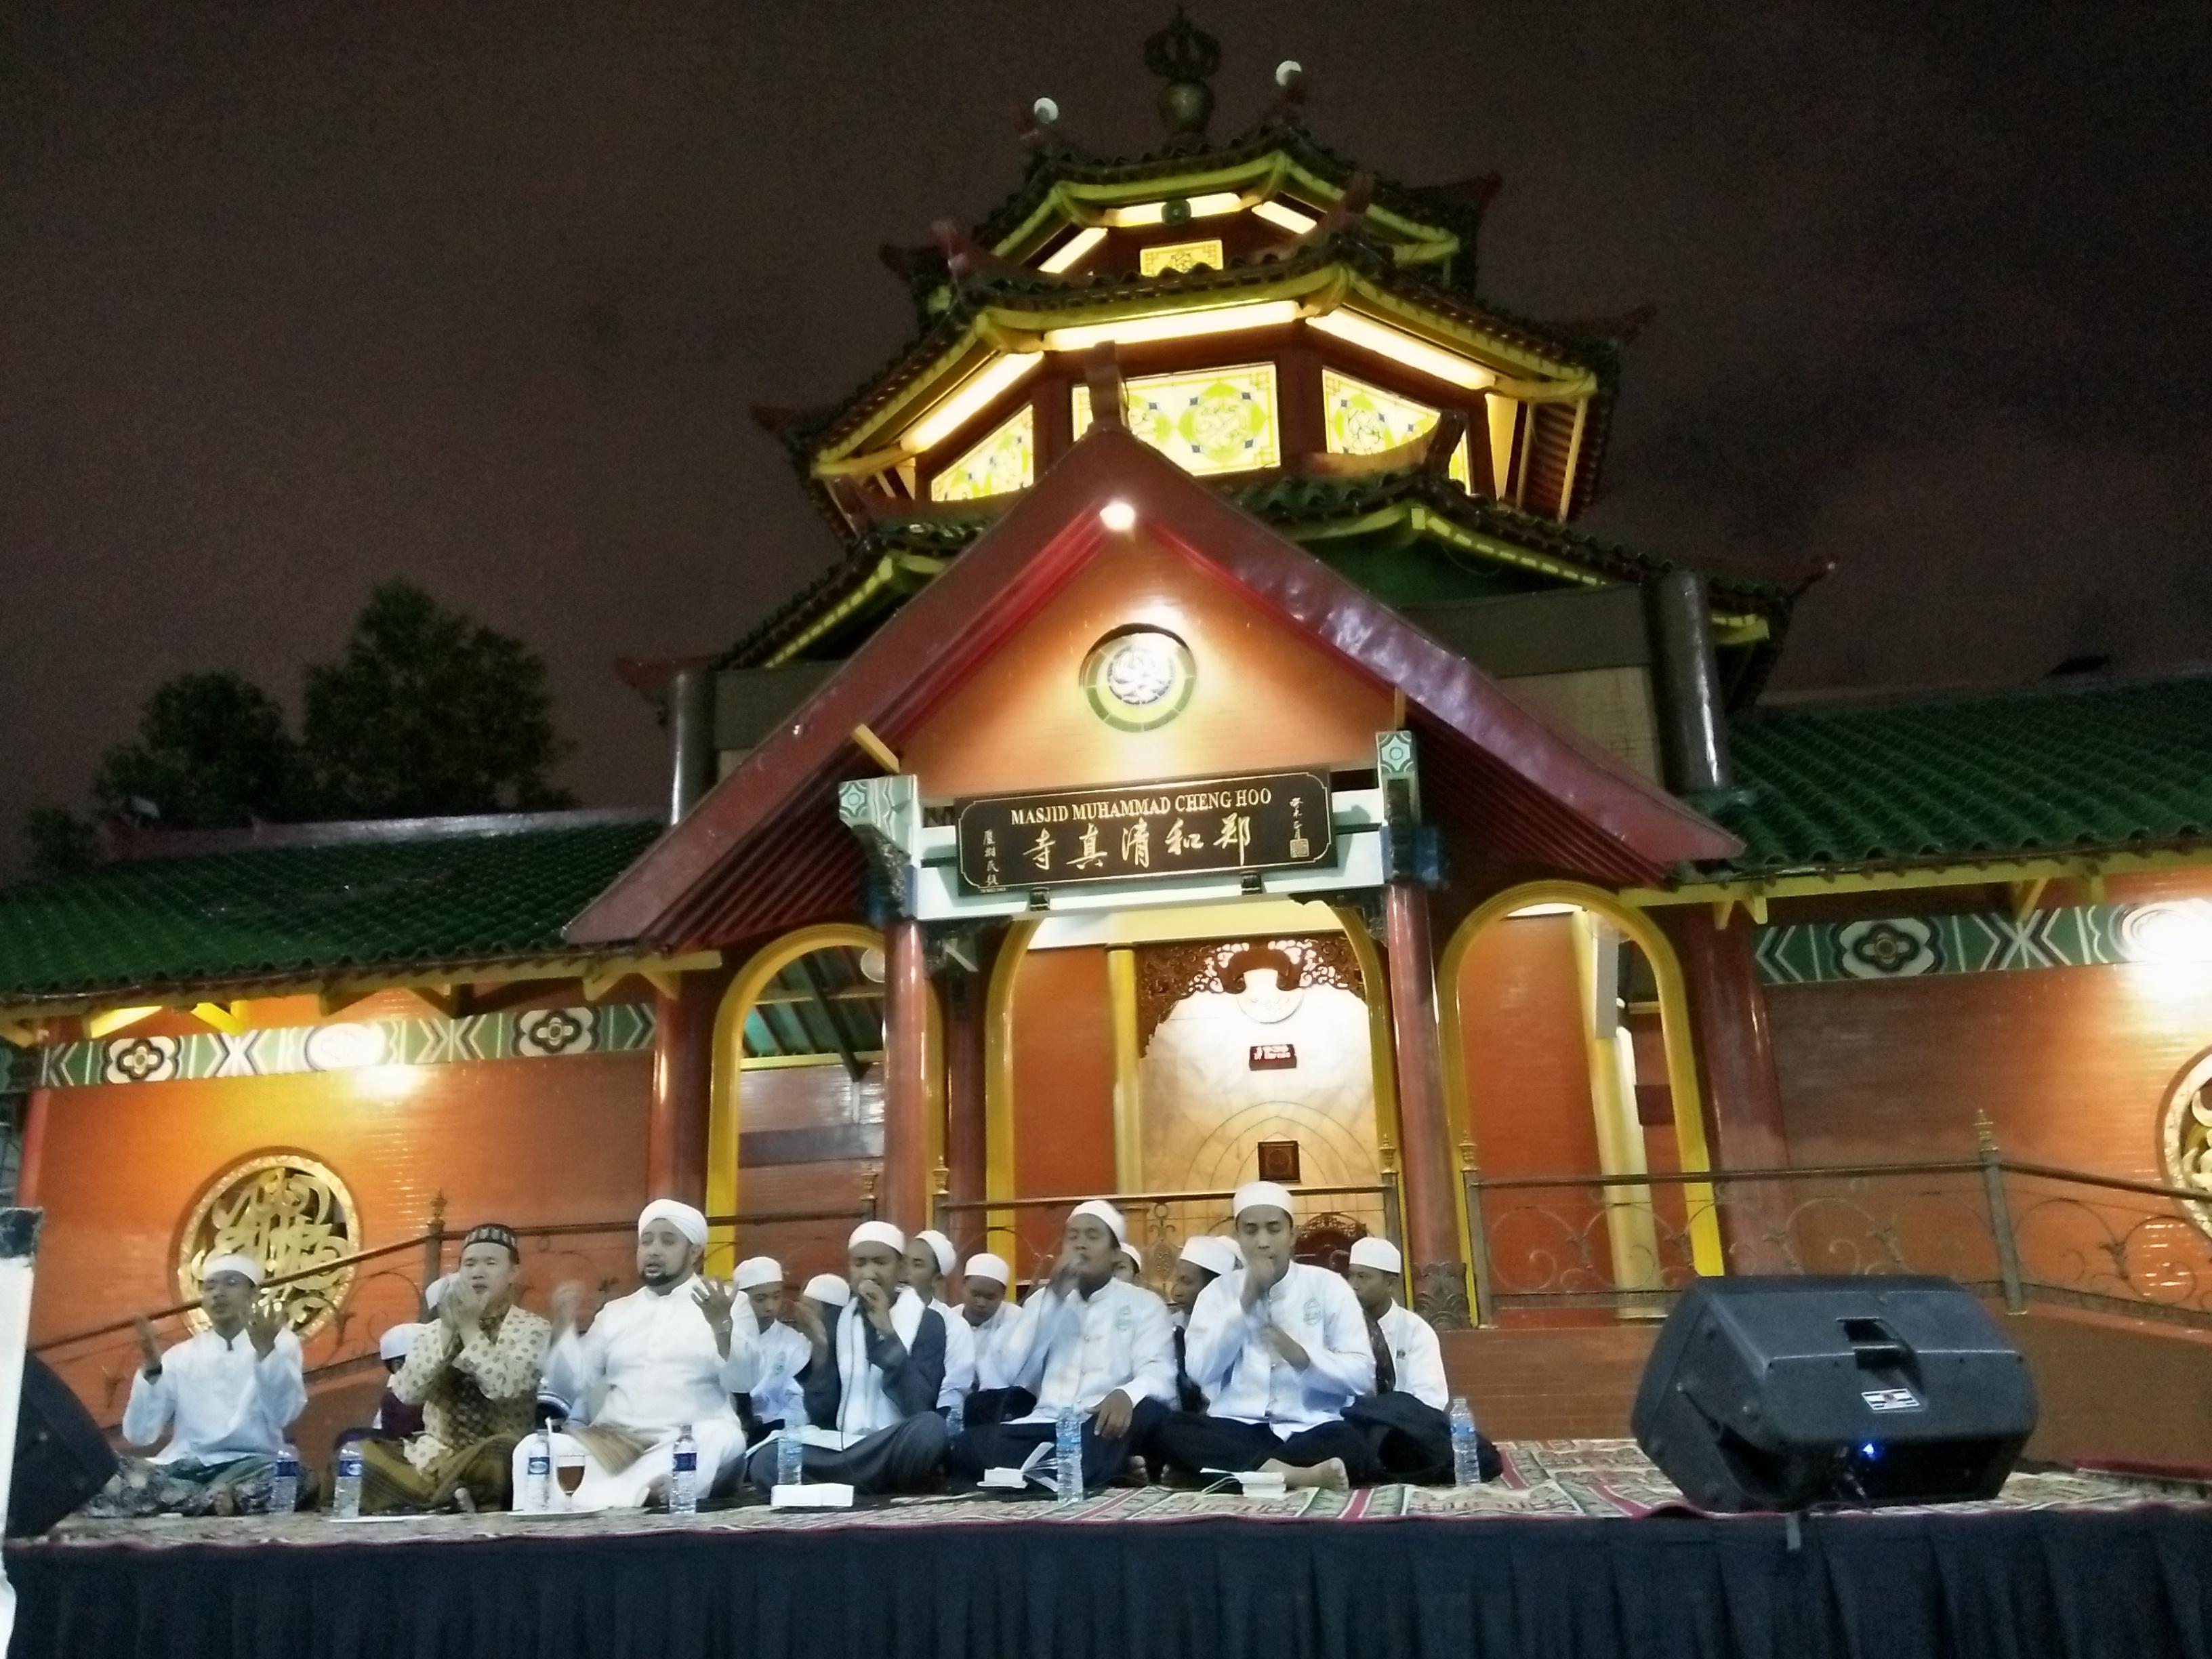 Peringati Maulid Nabi, Masjid Cheng Hoo Surabaya Gelar Pengajian Akbar